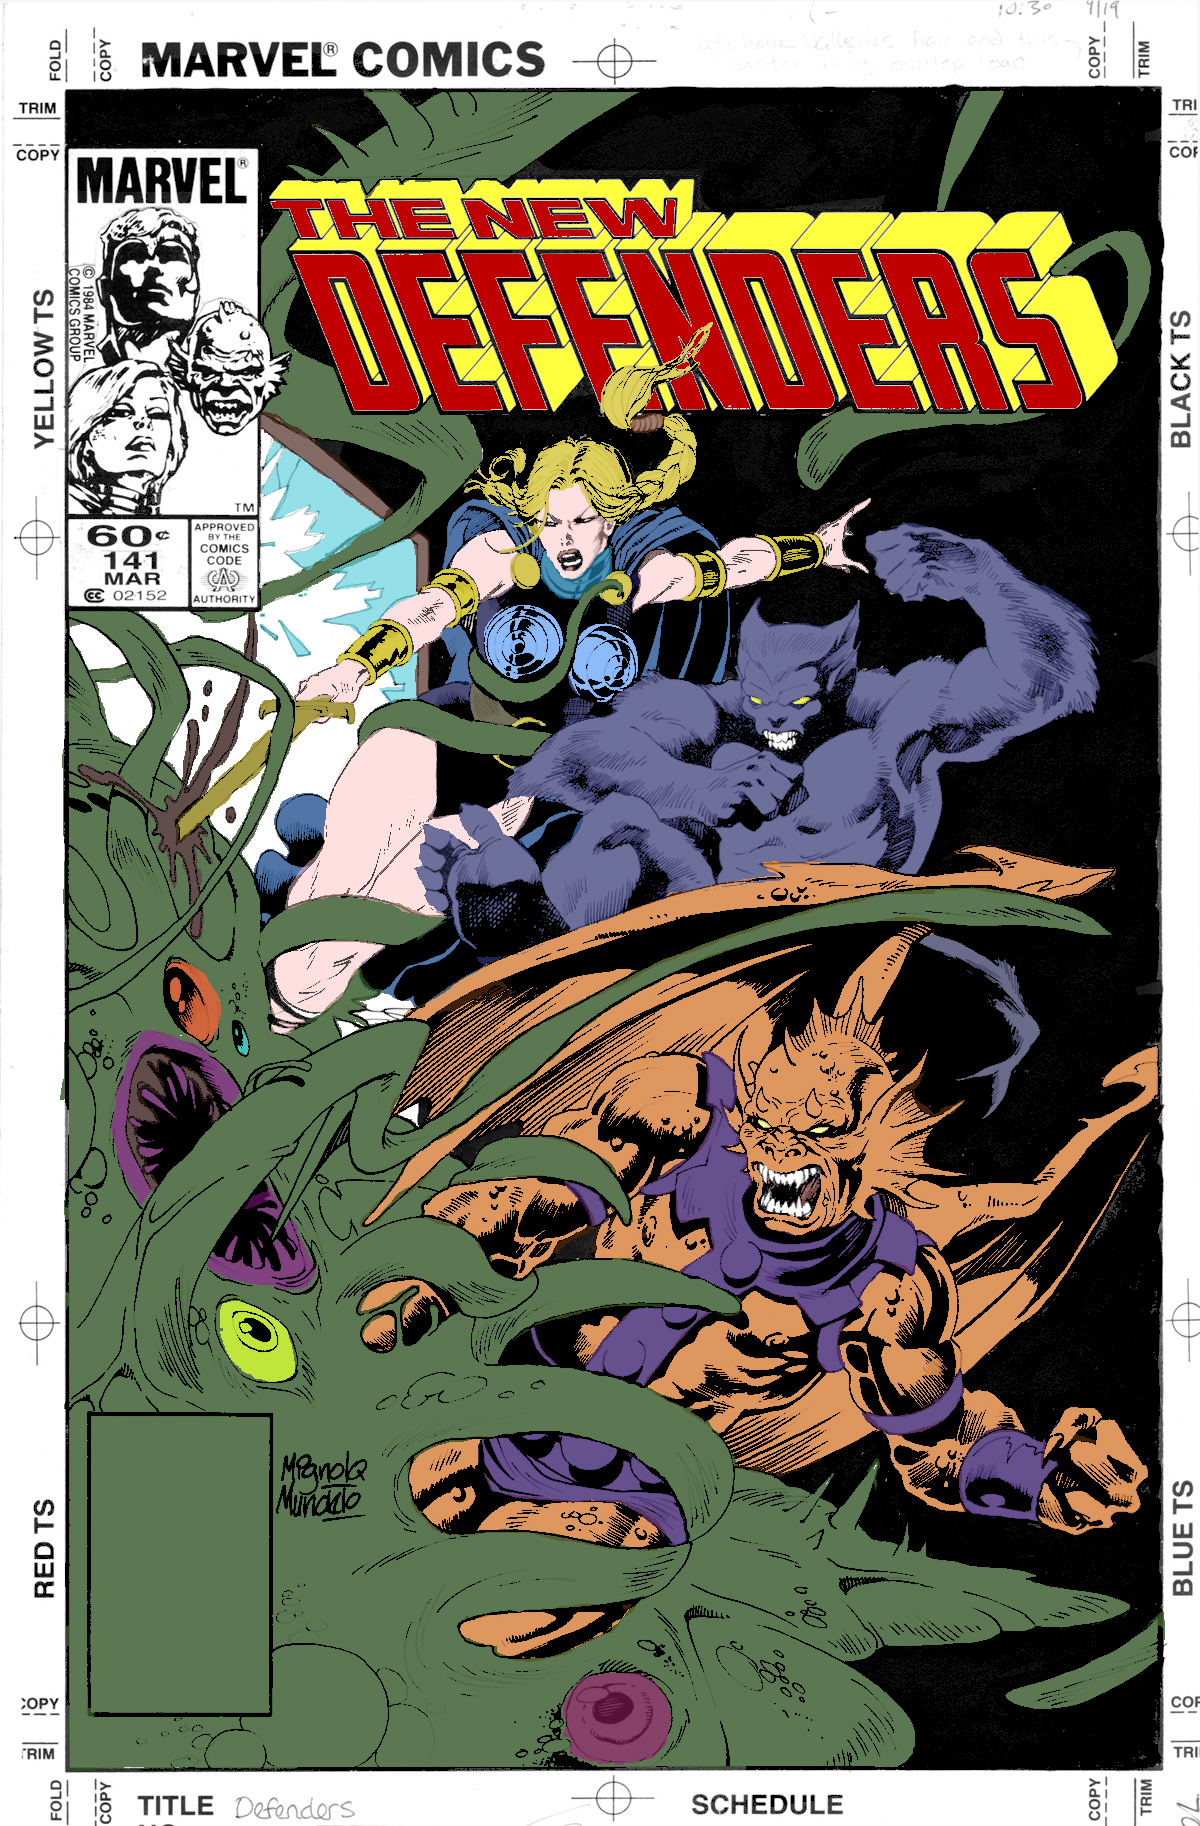 Digitally coloring B&W Images. Defenders141